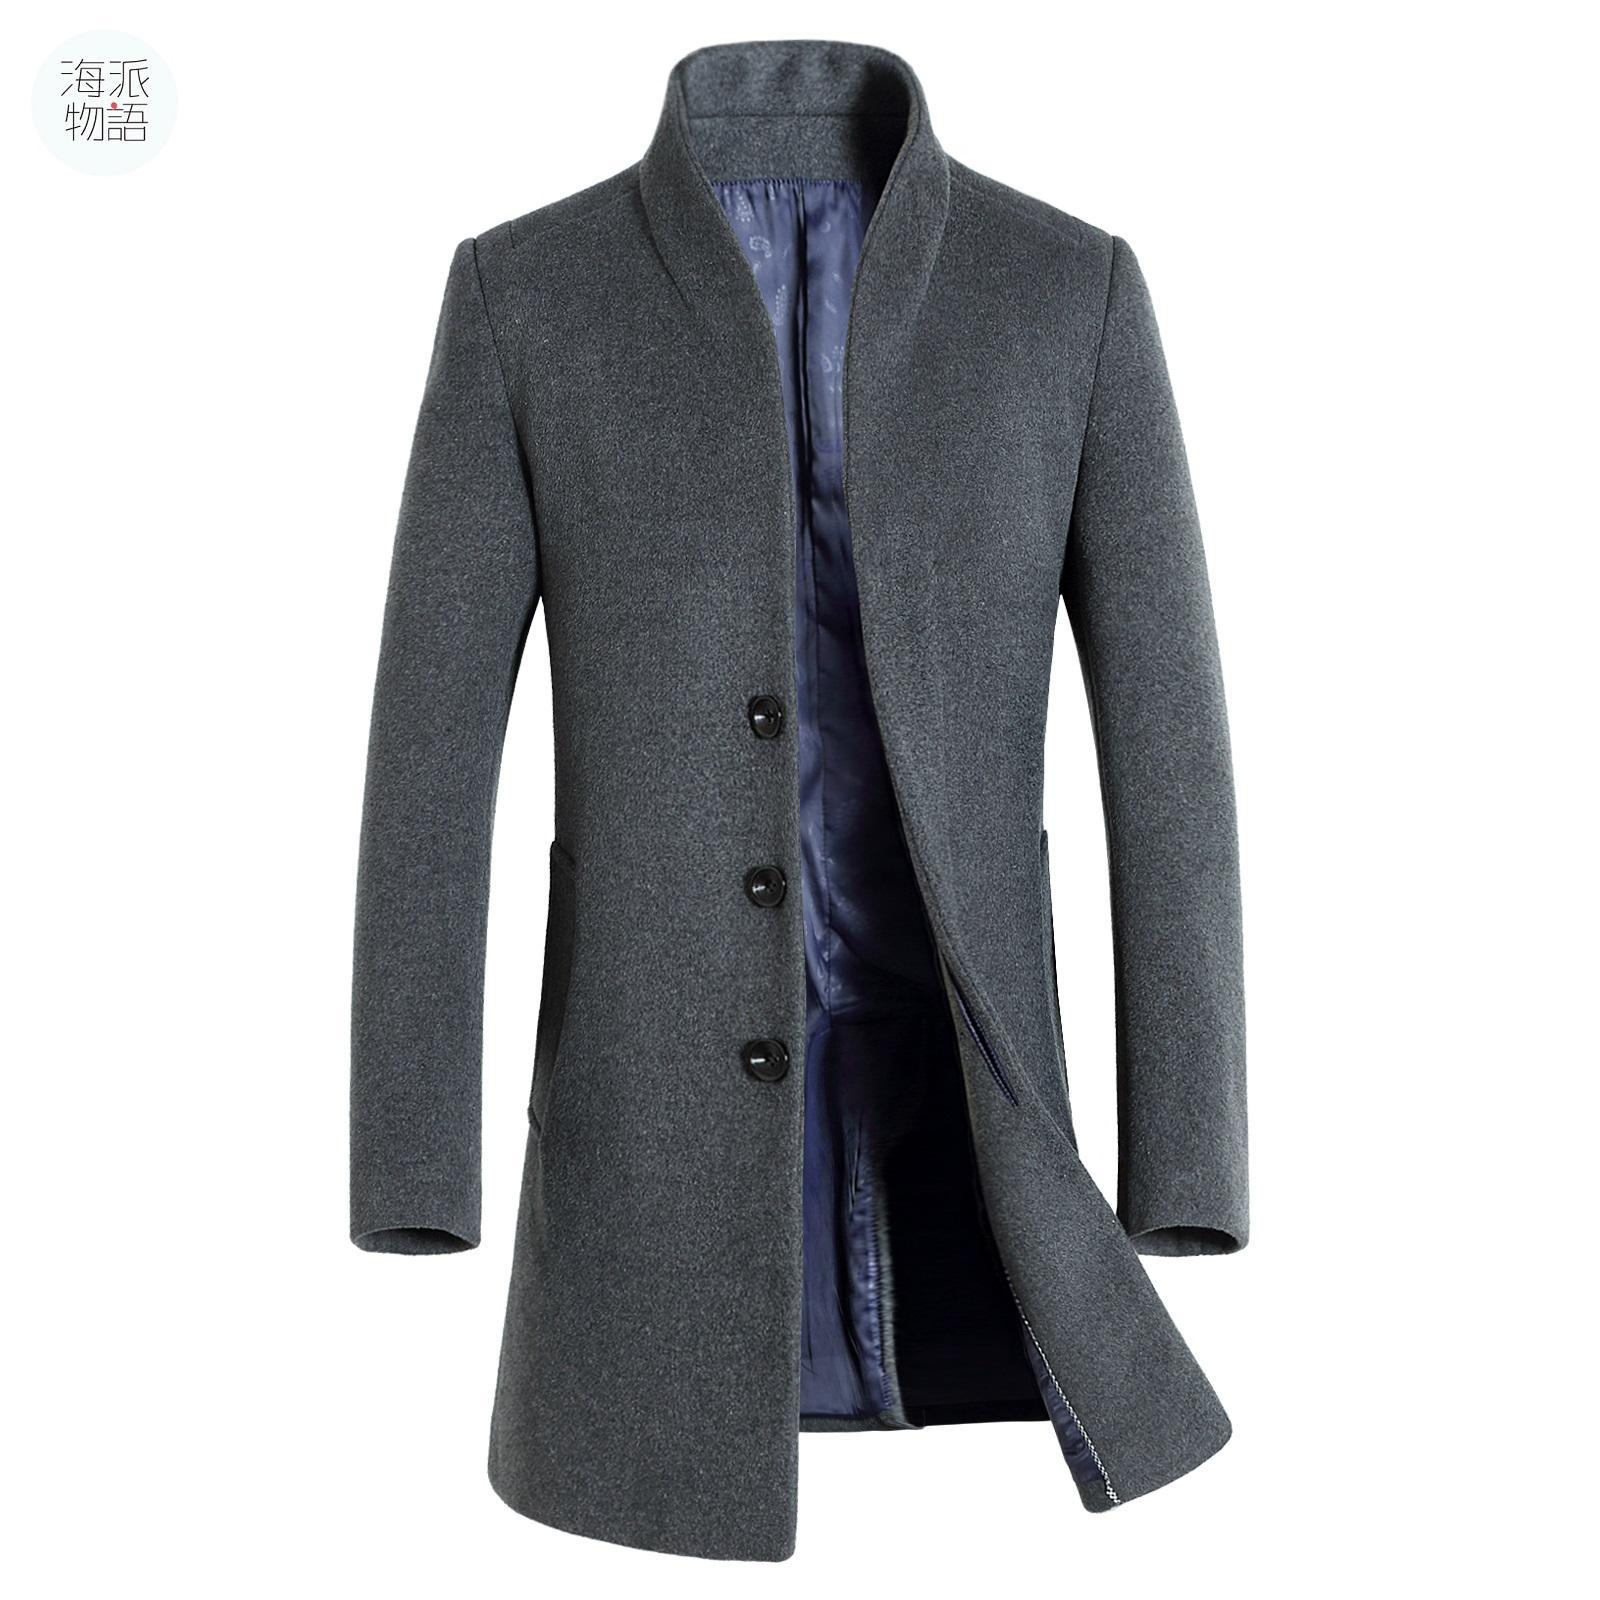 2861ab61d Shanghai Story mens long trench coat wool coat fashion buckle woolen coat  business mens winter 5 color